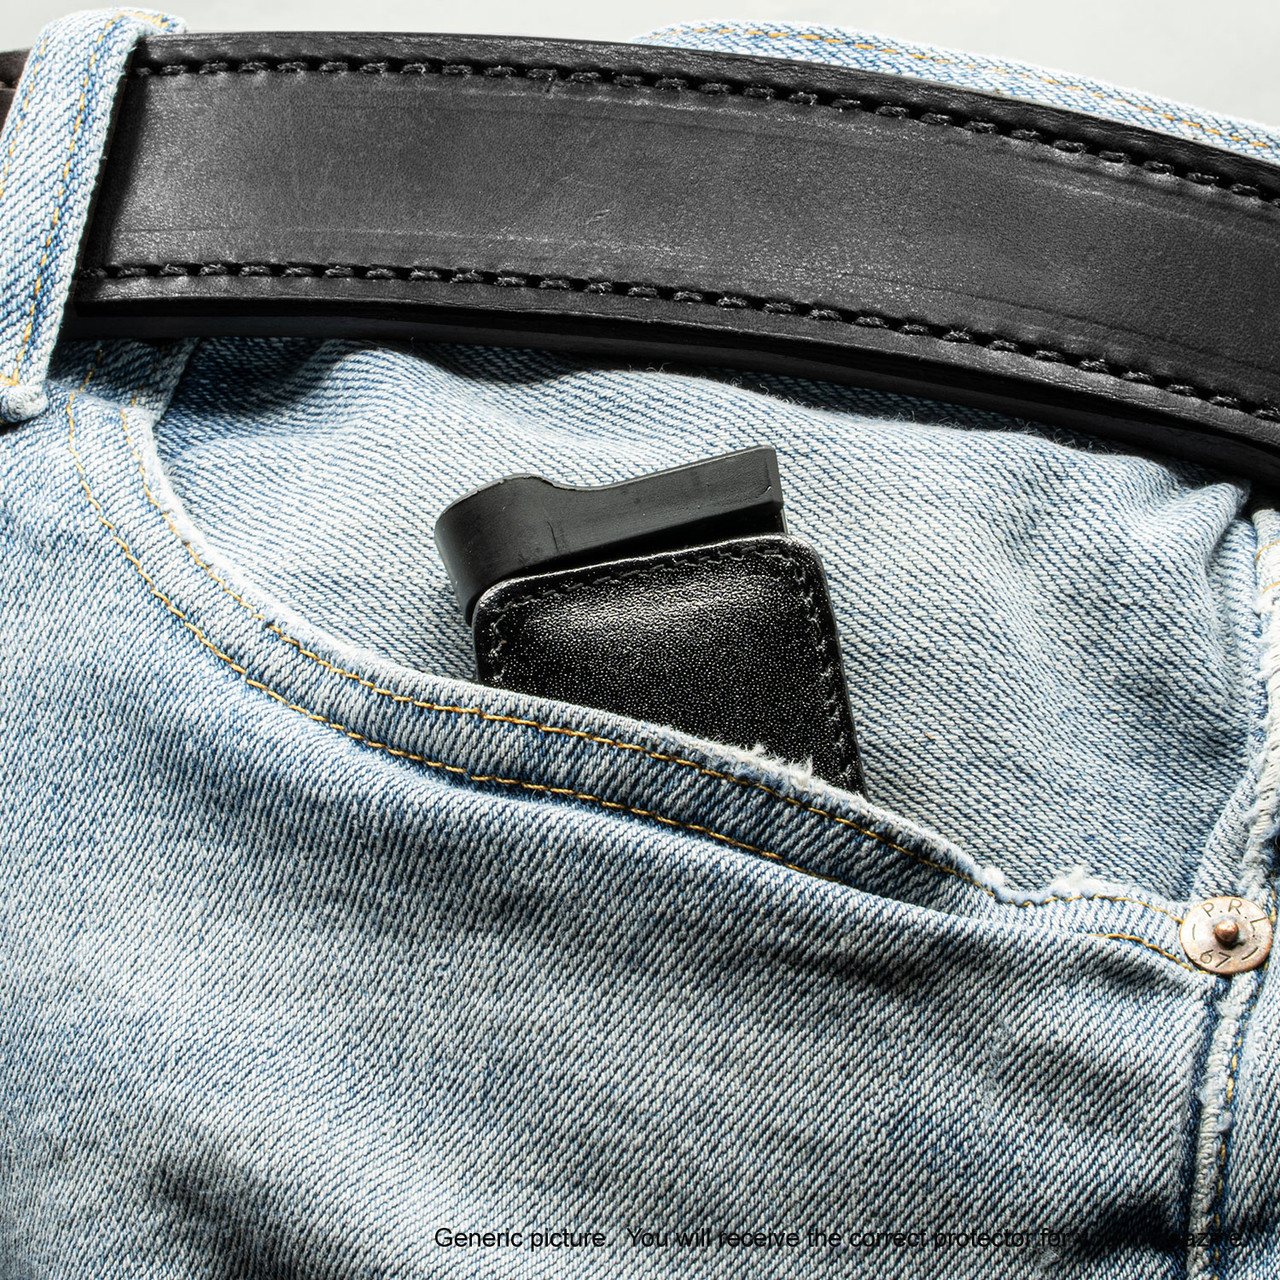 Sig Sauer P250 Compact Black Leather Magazine Pocket Protector